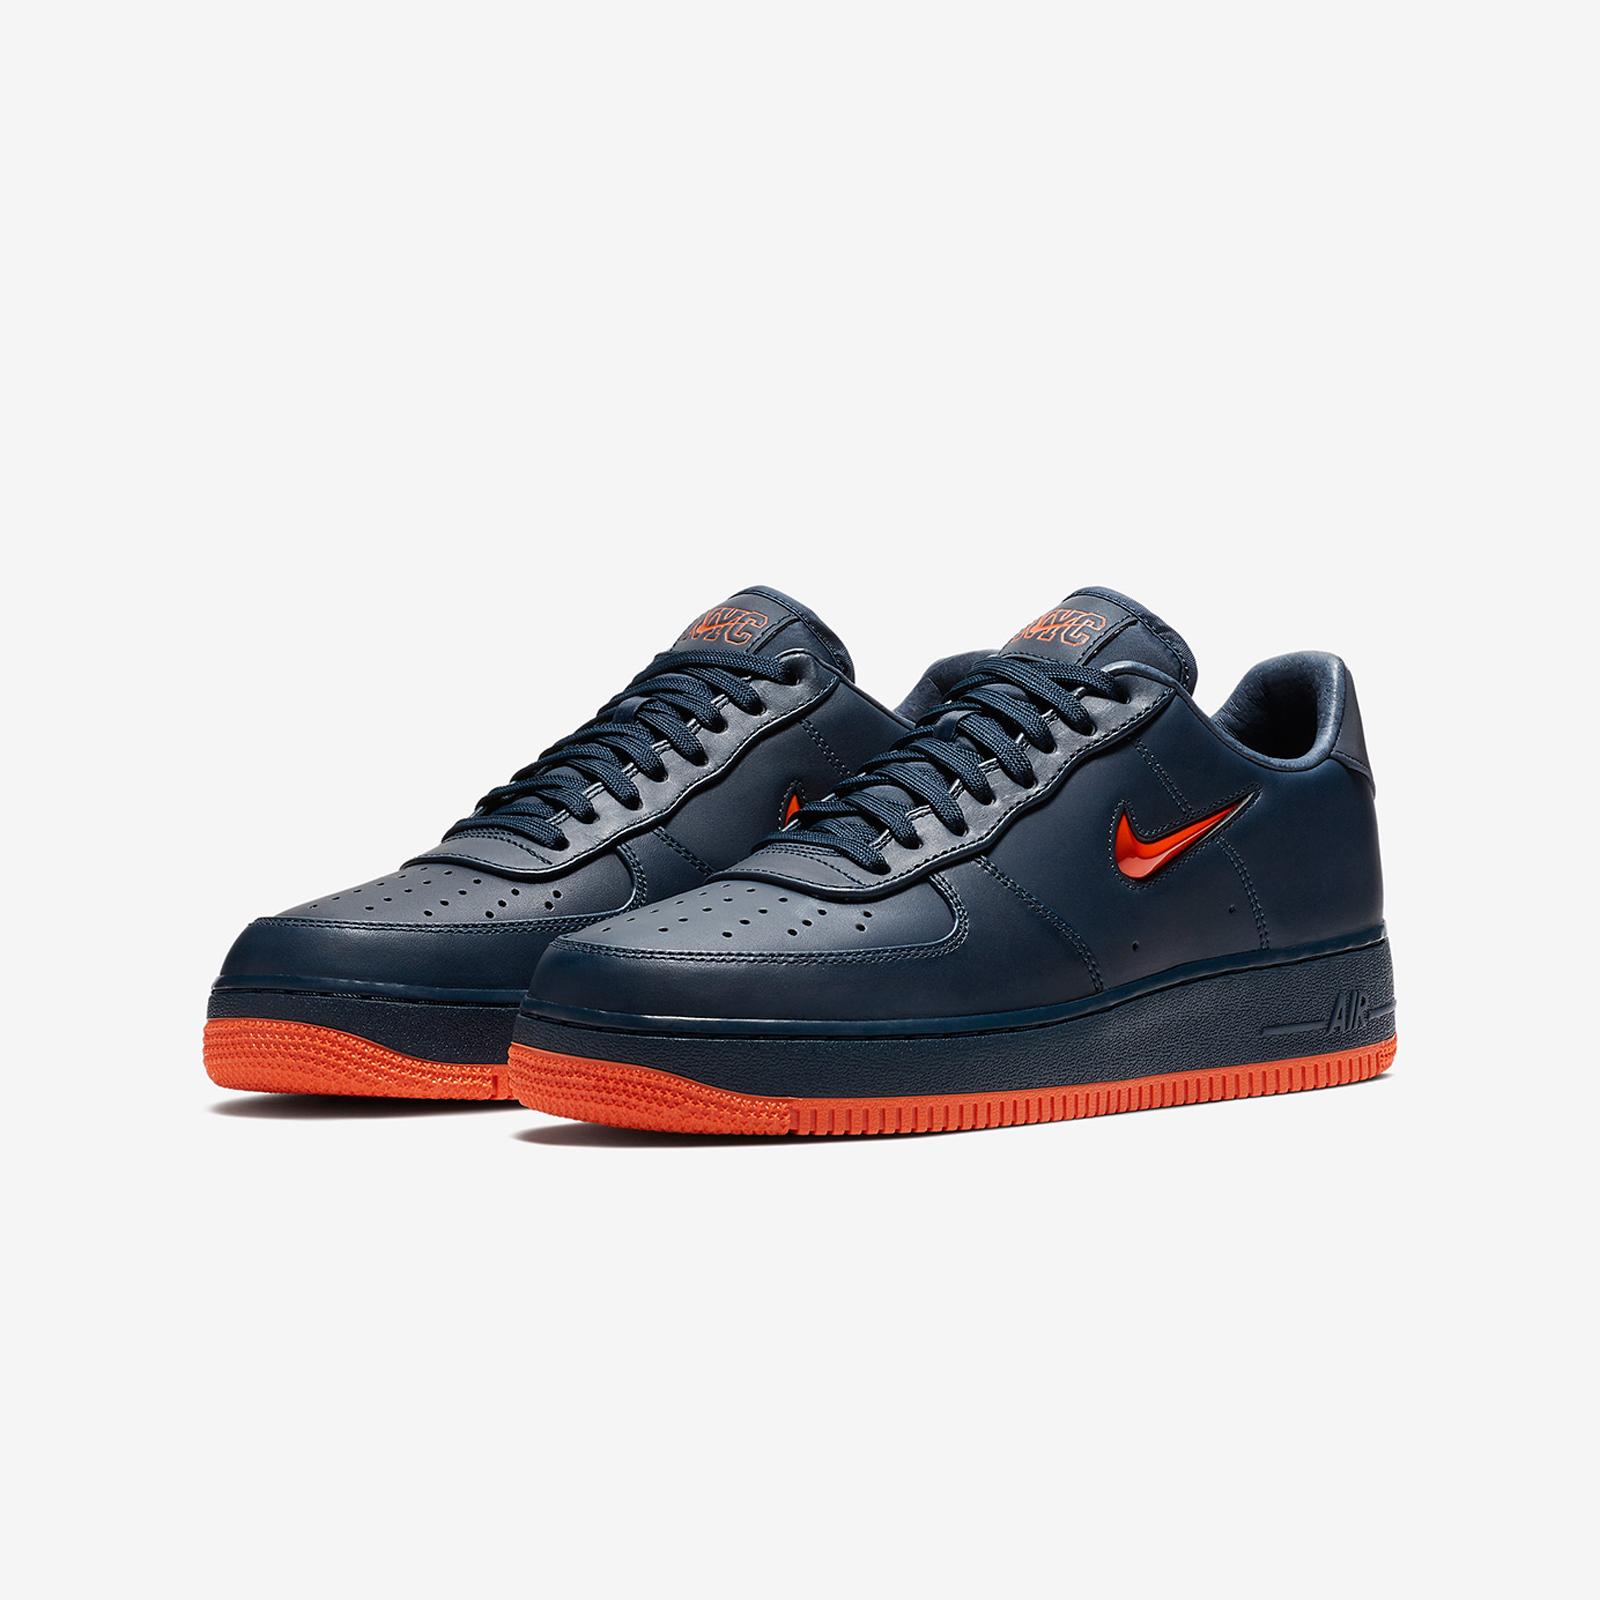 official store buy dirt cheap Nike Air Force 1 Low Retro Premium - Ao1635-400 ...